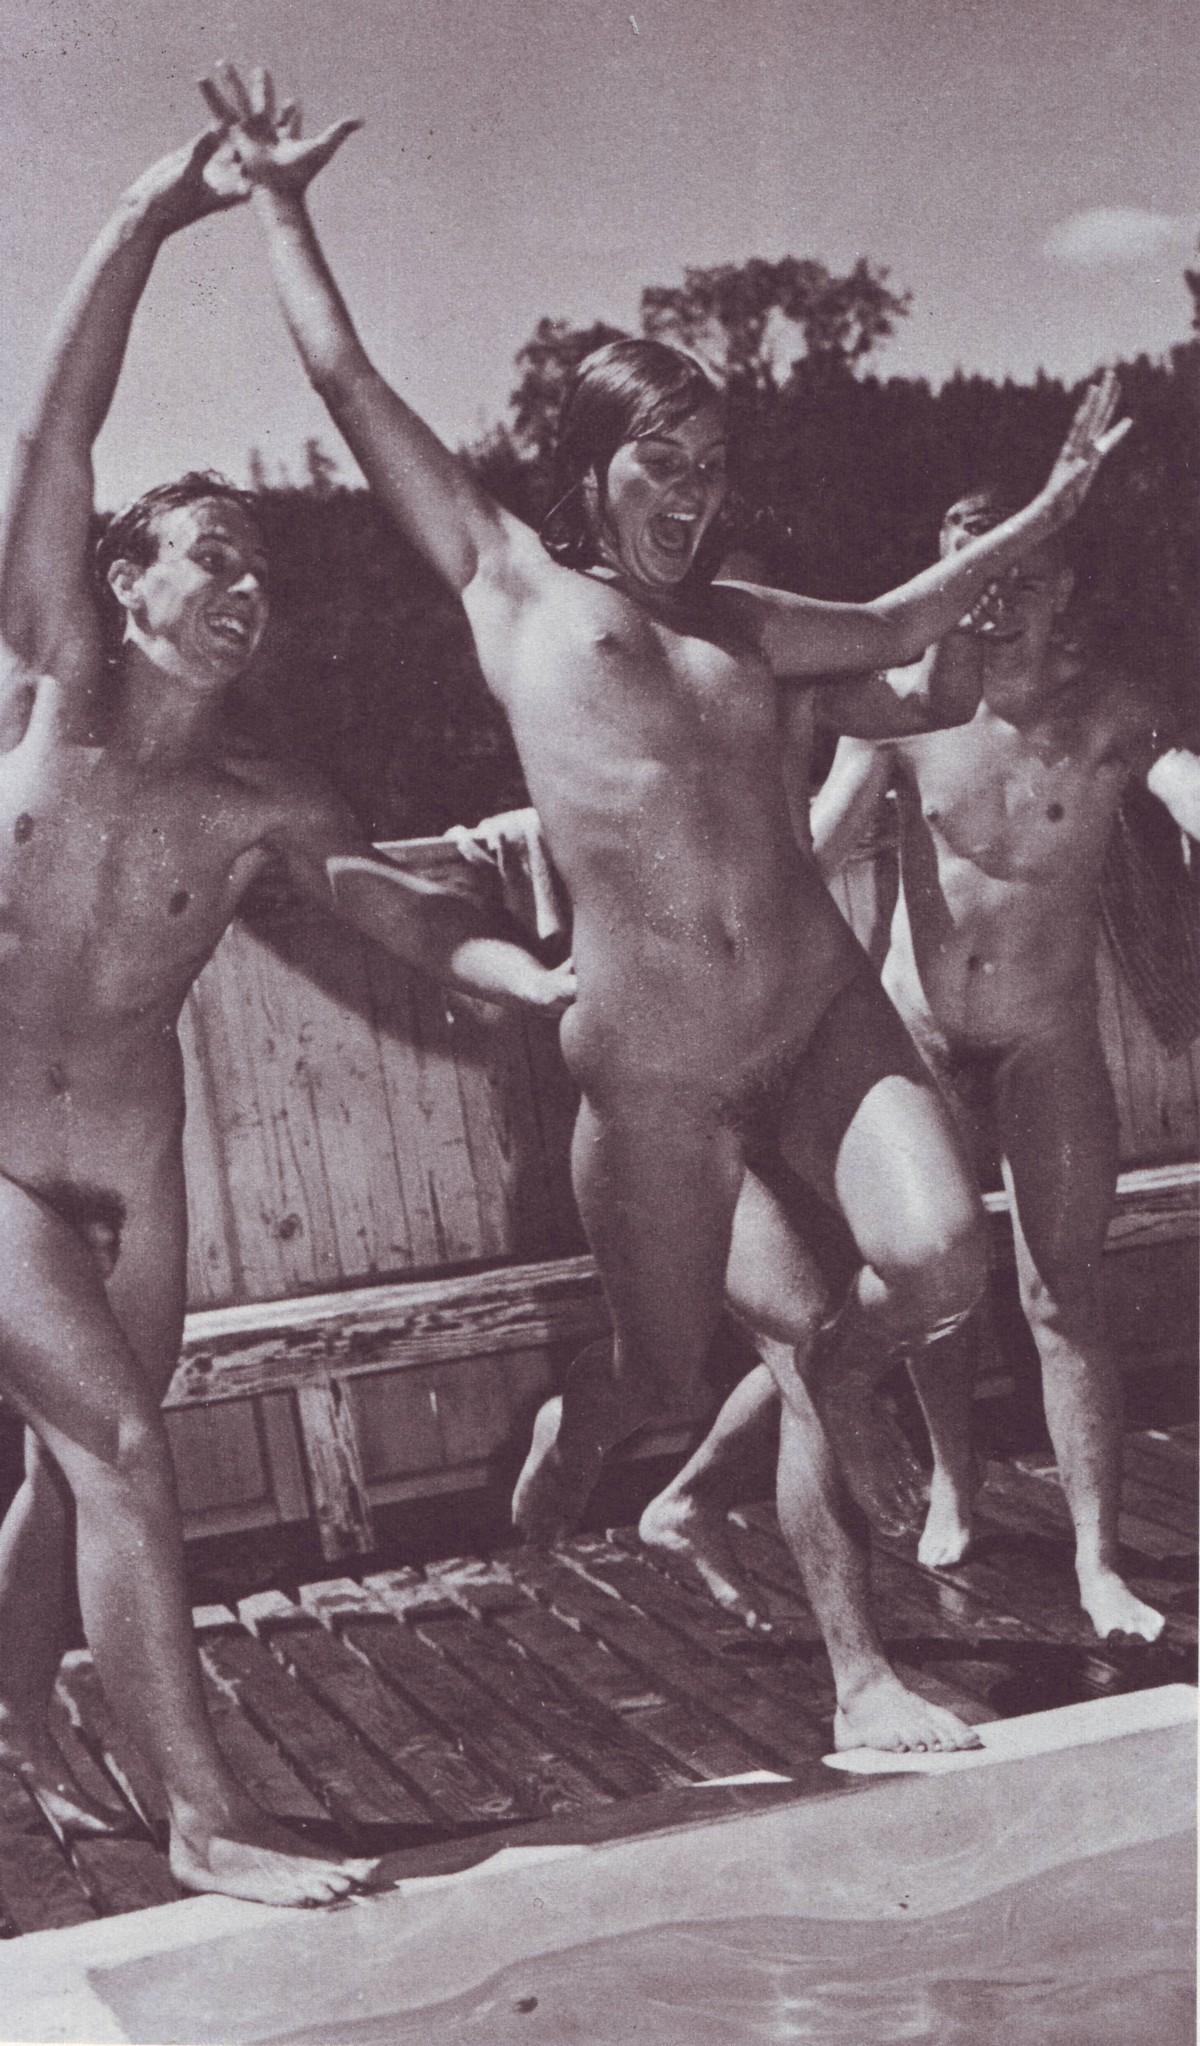 Nude swim vintage, gifs blonde women fucking wildly nude